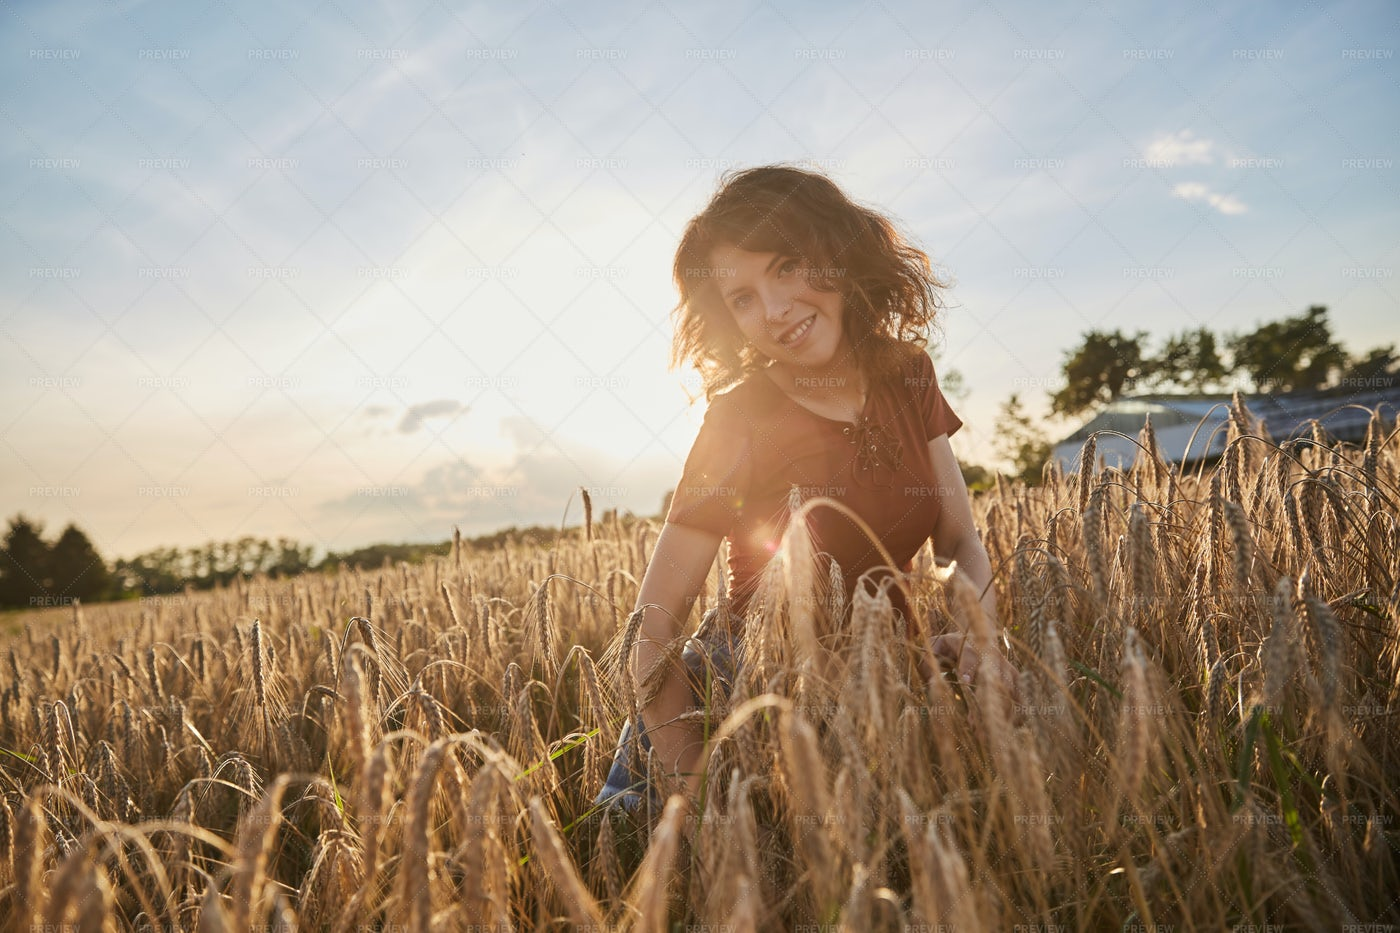 Woman On Wheat Field: Stock Photos